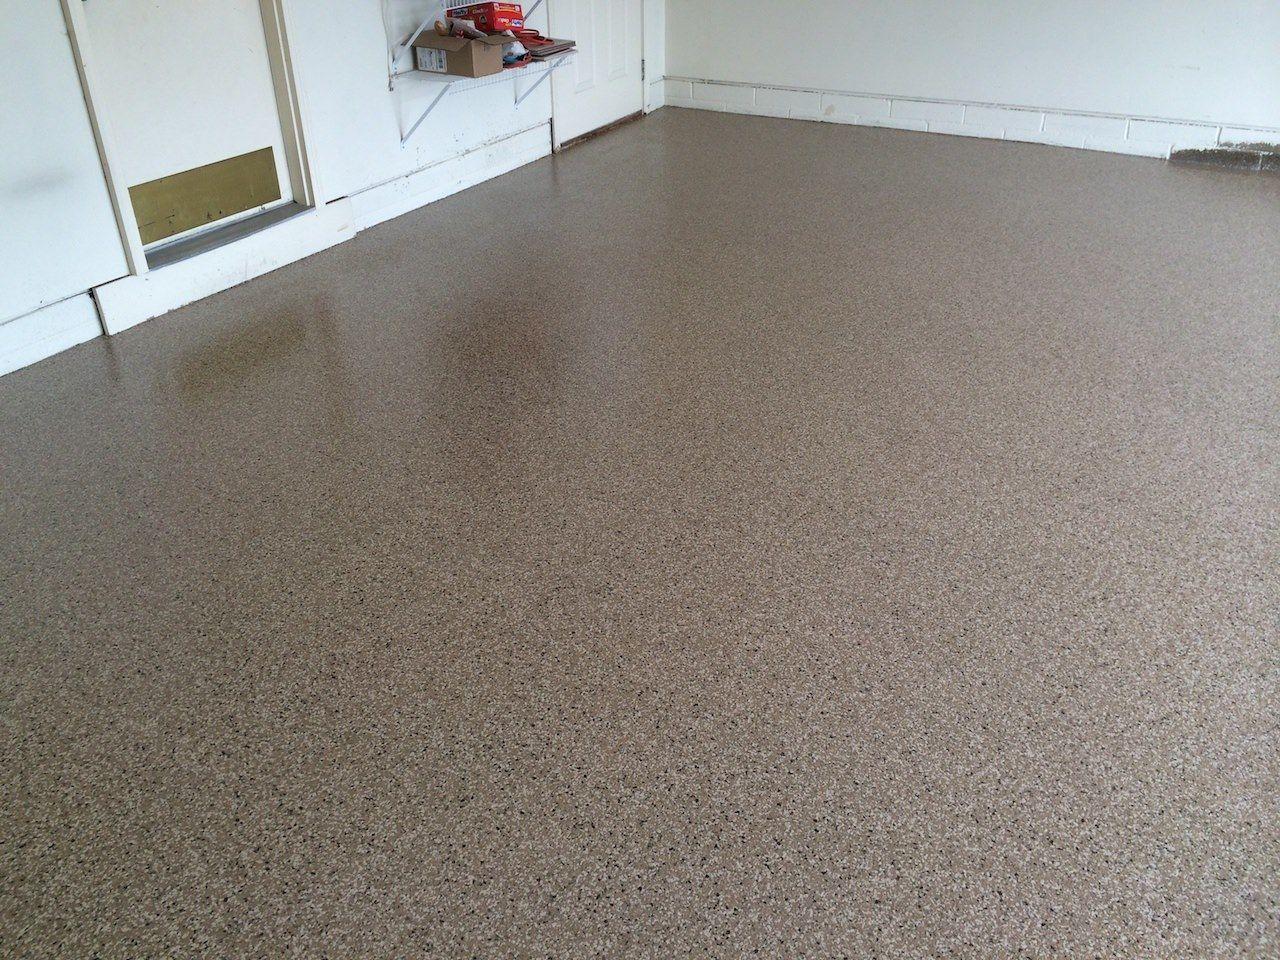 Concrete Resurfacing Epoxy Flooring Peoria Bloomington Il Epoxy Floor Flooring Concrete Decor